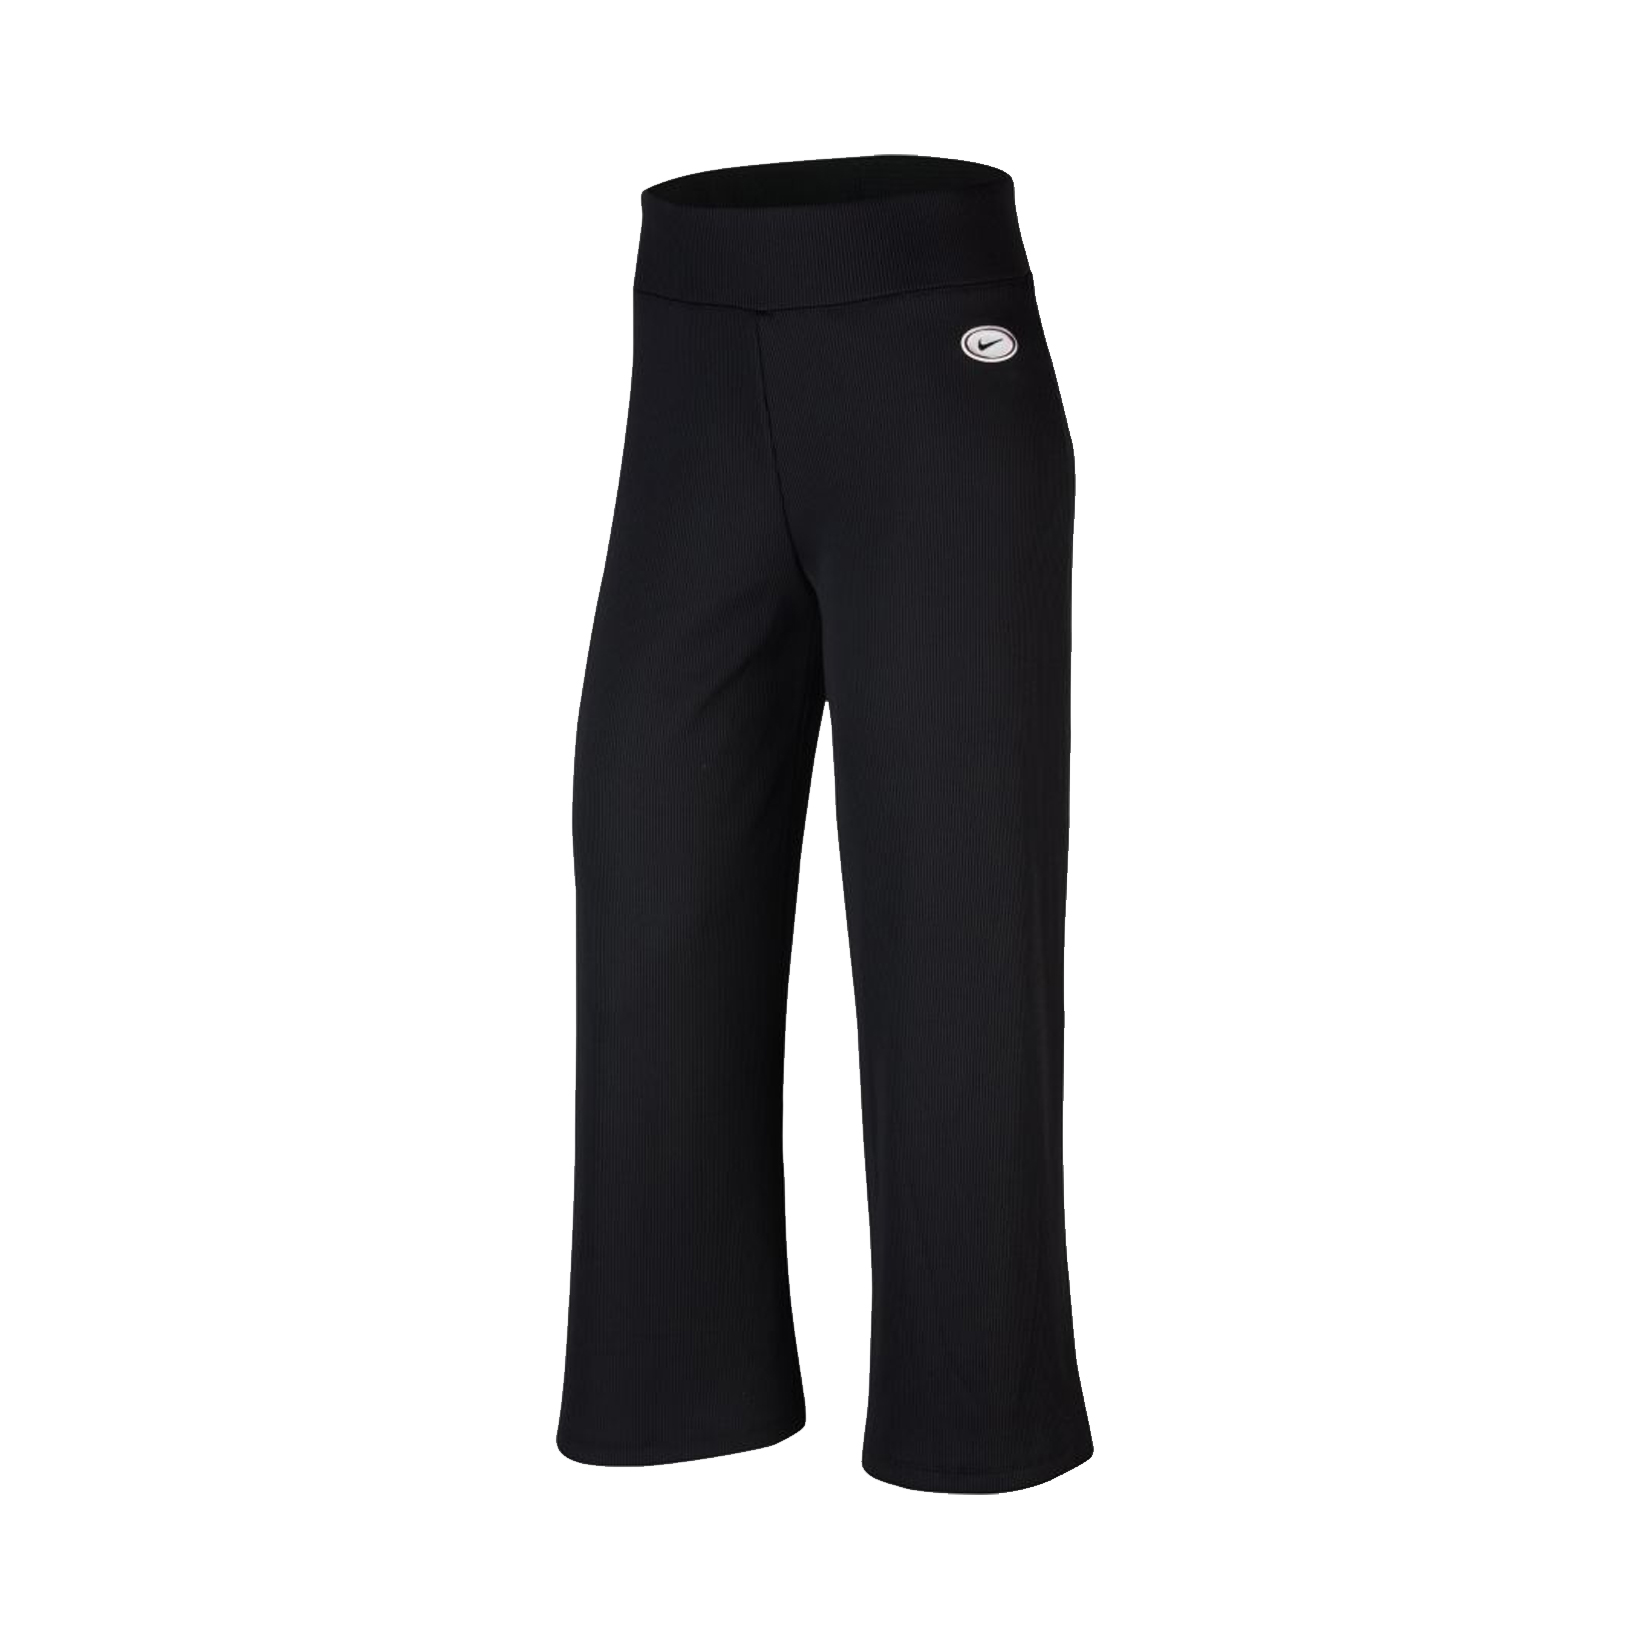 Nike Sportswear Ribbed Pants Black